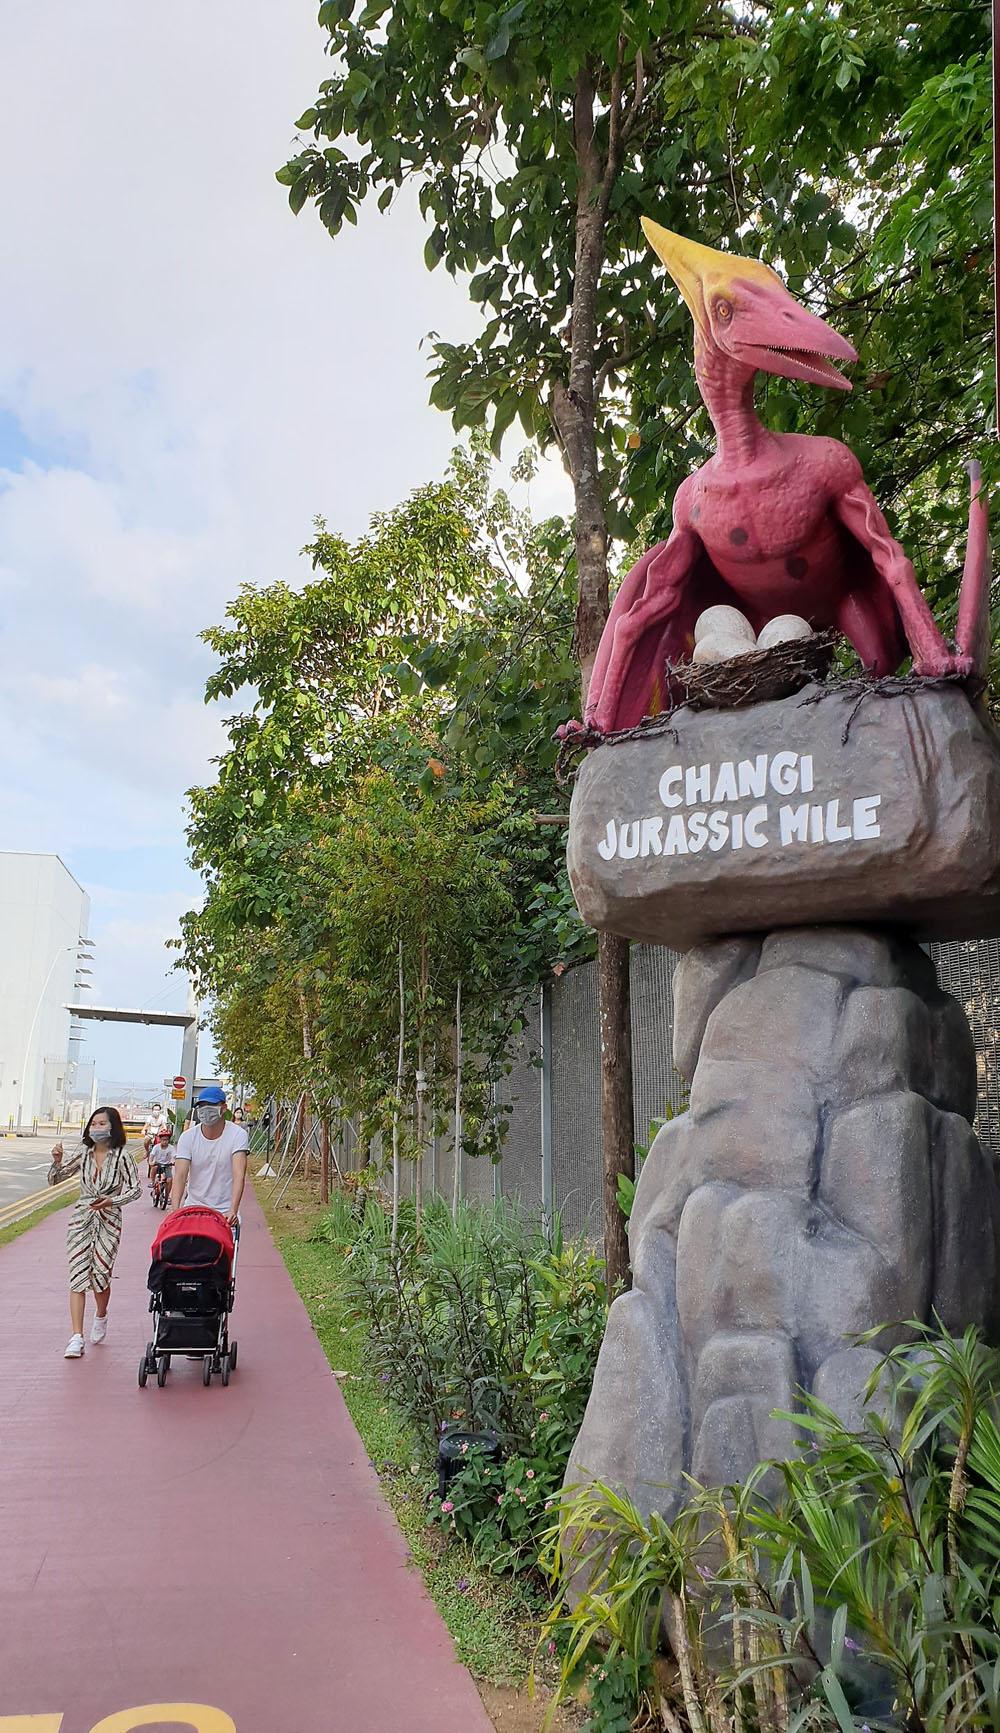 Changi Jurassic Mile Entrance